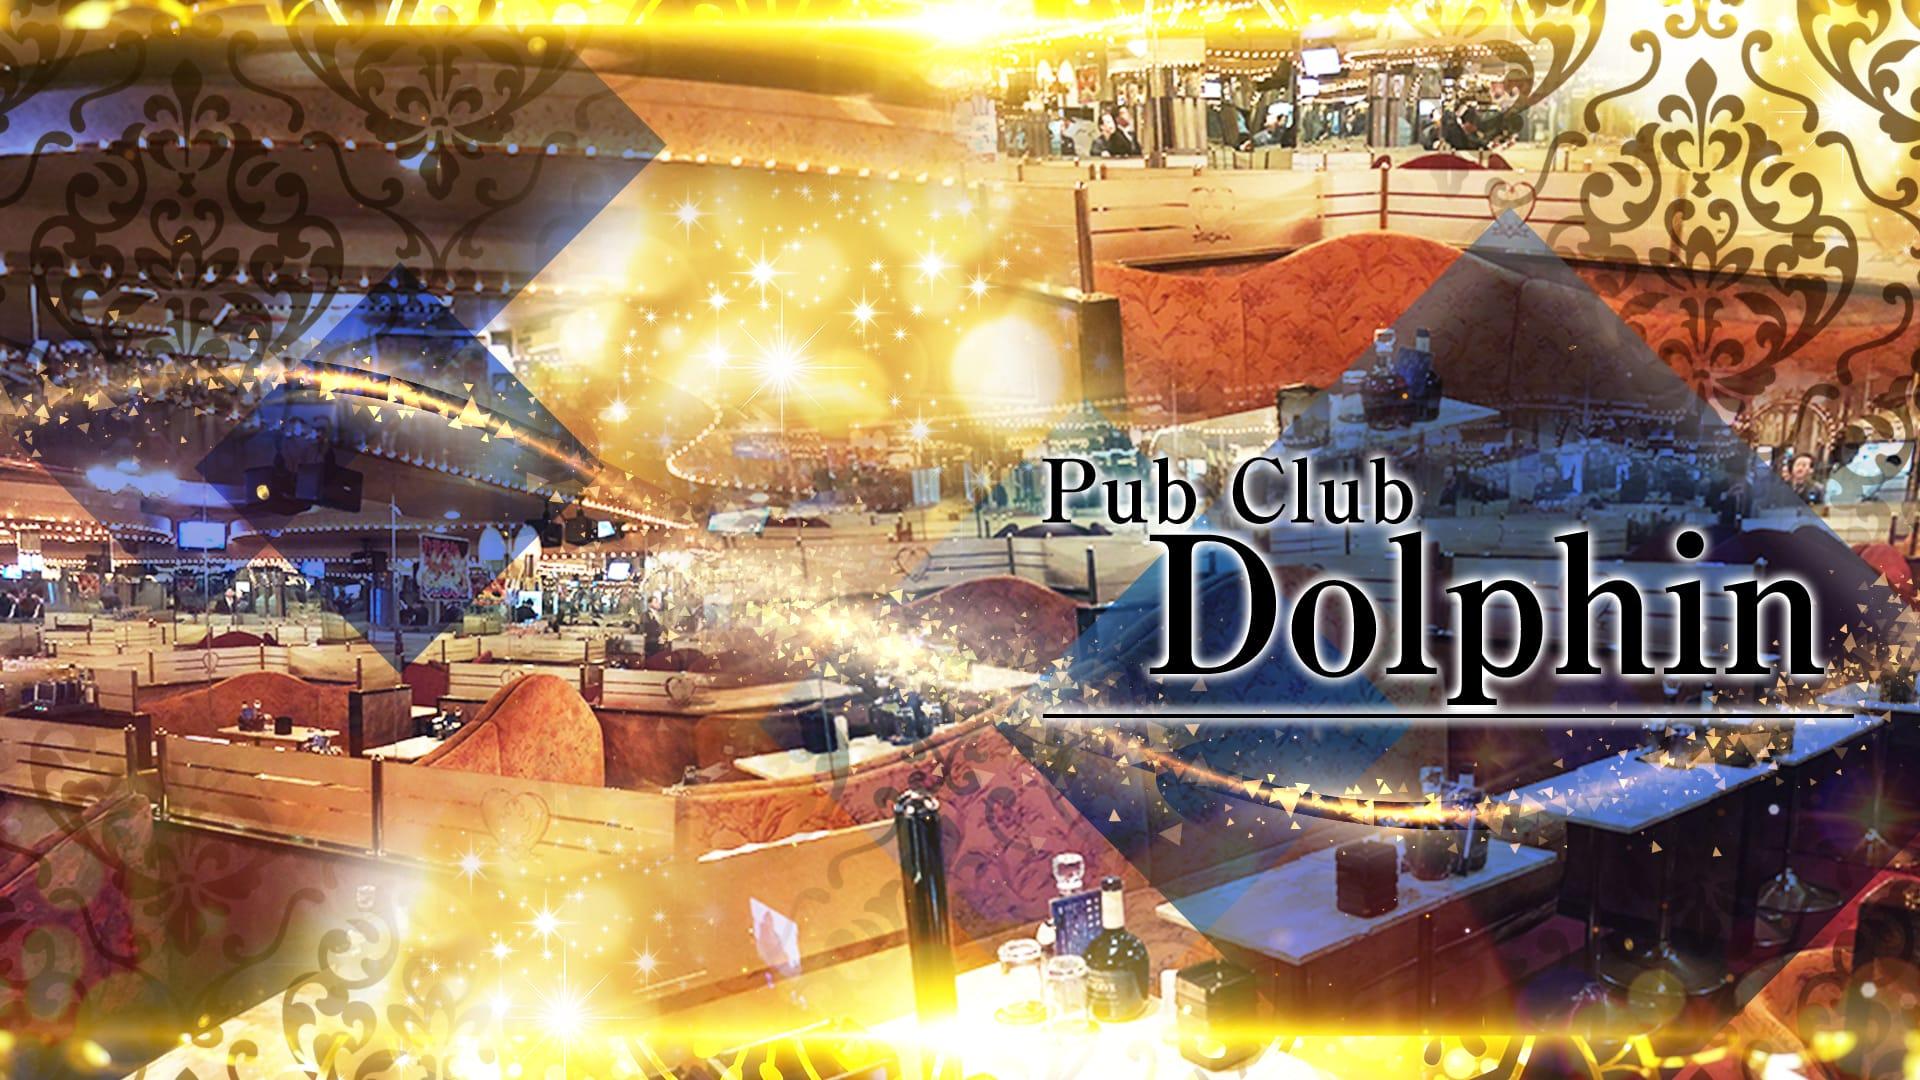 PUB CLUB Dolphin(ドルフィン)【公式求人・体入情報】 品川キャバクラ TOP画像